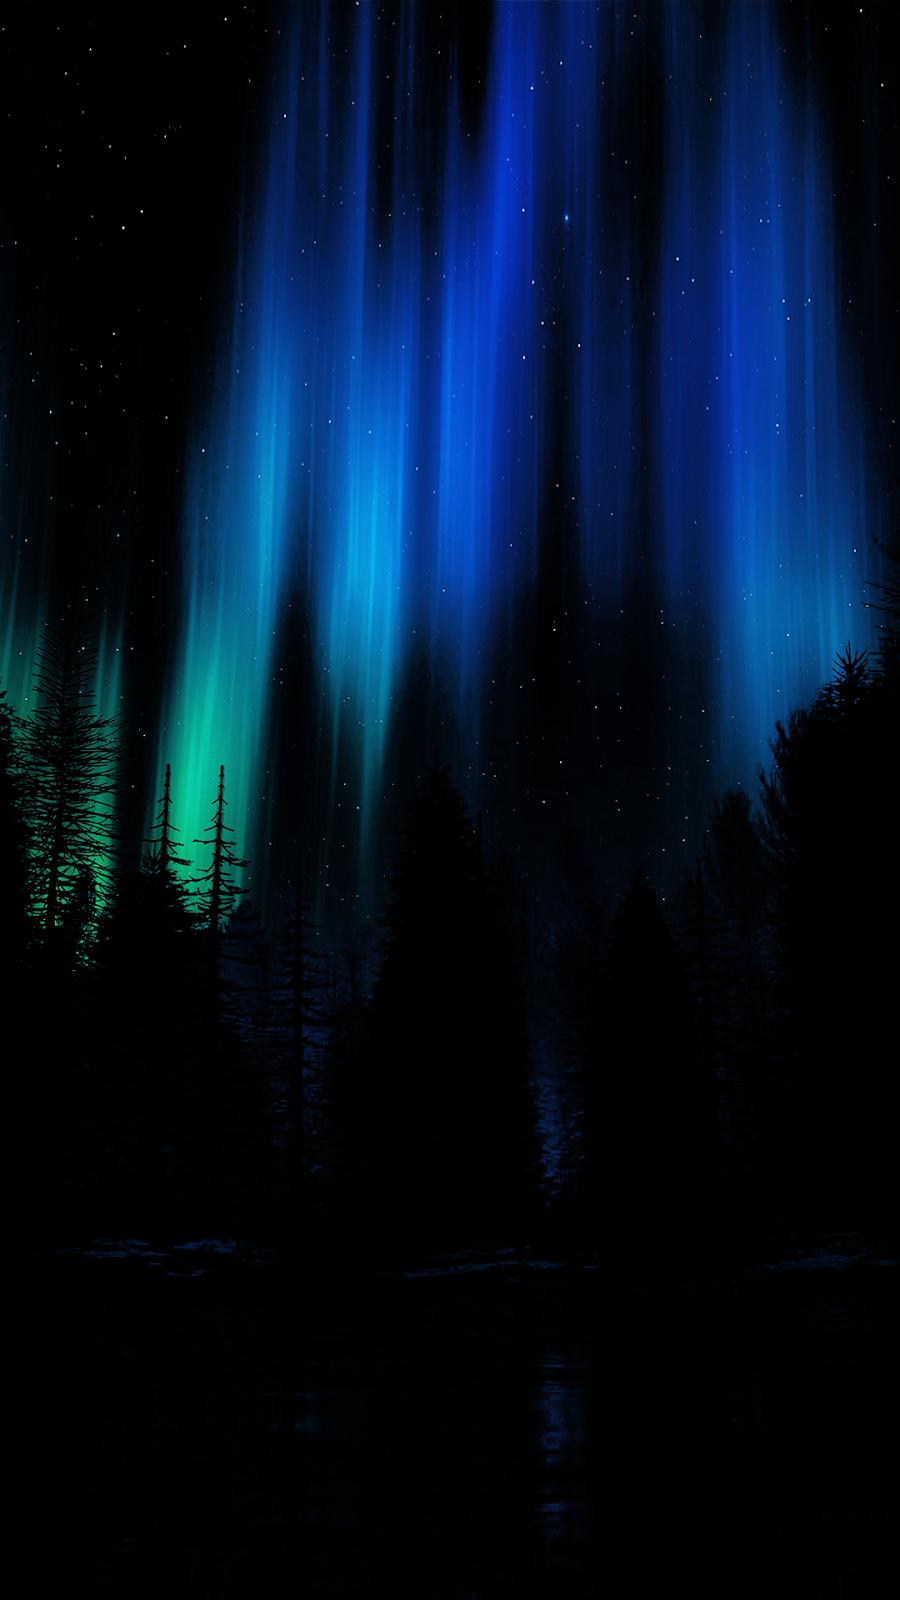 Aurora Borealis Wallpaper Iphone Android Background Deadpool Wallpaper Beautiful Wallpapers Wallpaper Backgrounds